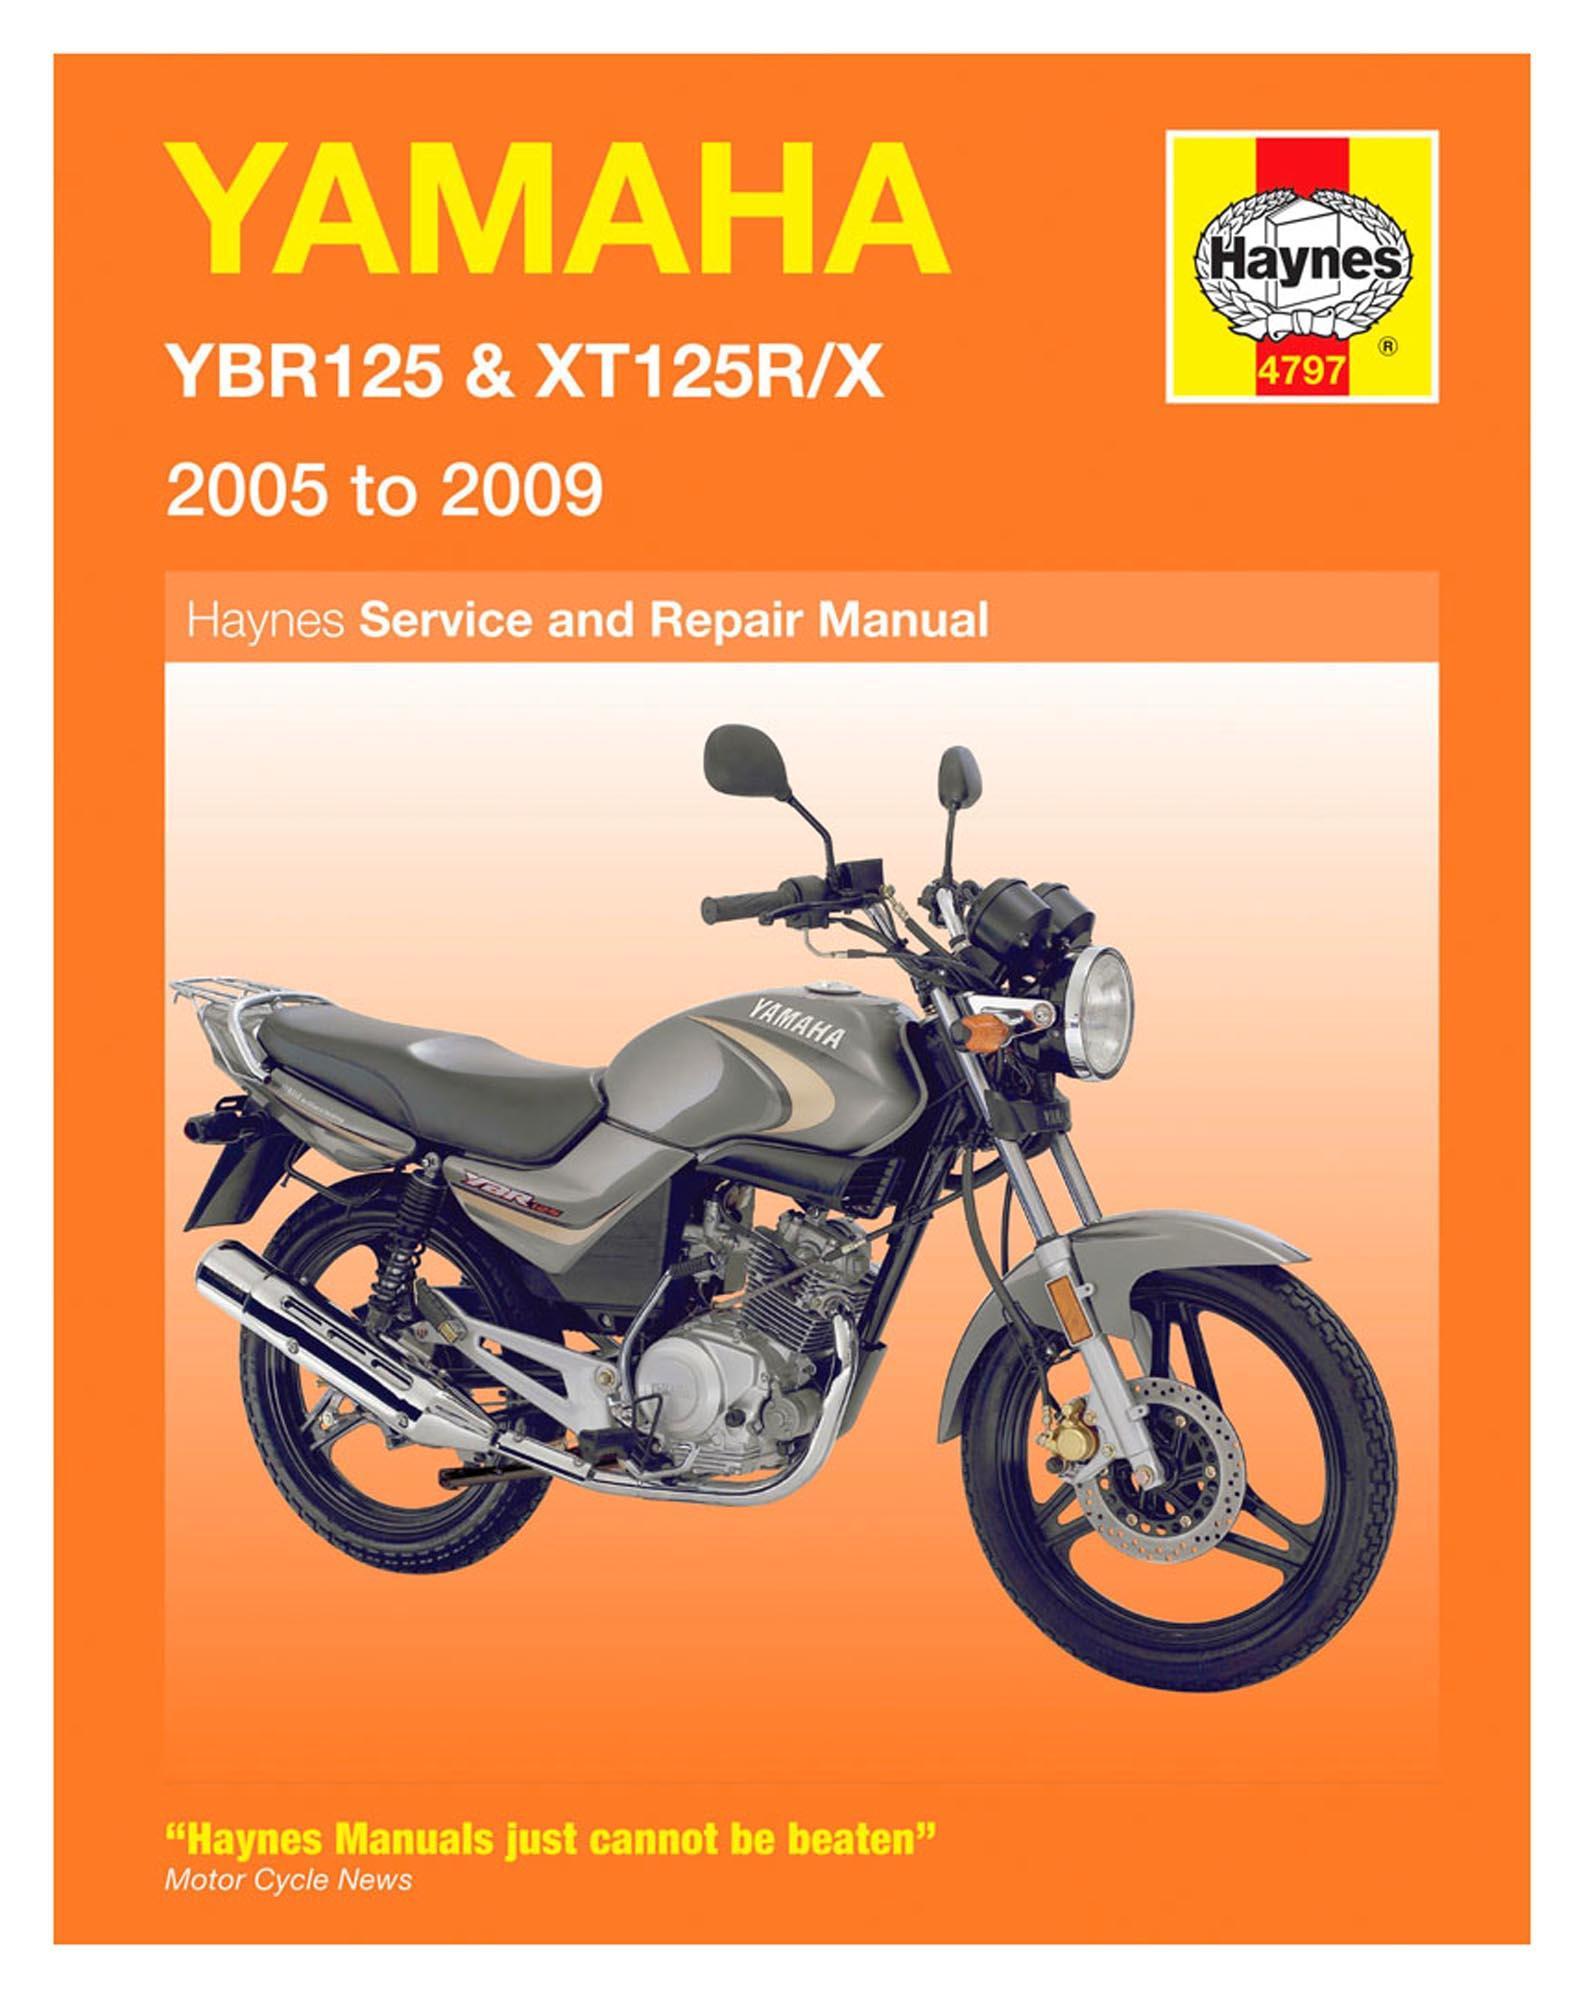 medium resolution of yamaha ybr 125 fuse box schematic diagramyamaha ybr 125 fuse box all wiring diagram yamaha ybr